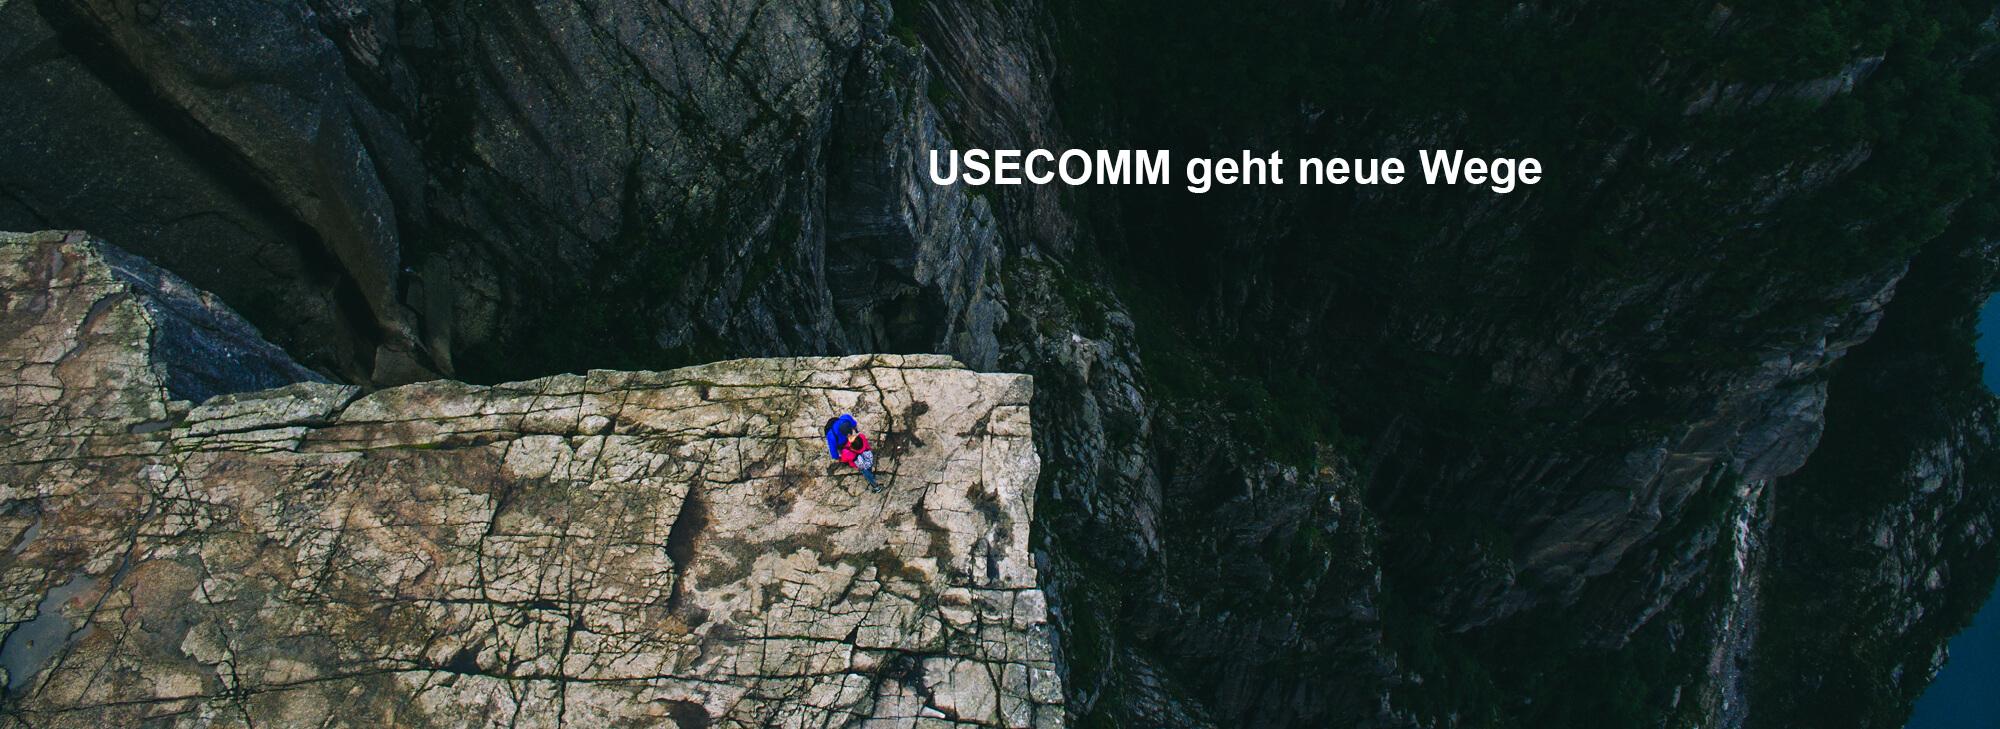 usecomm-berge-wege